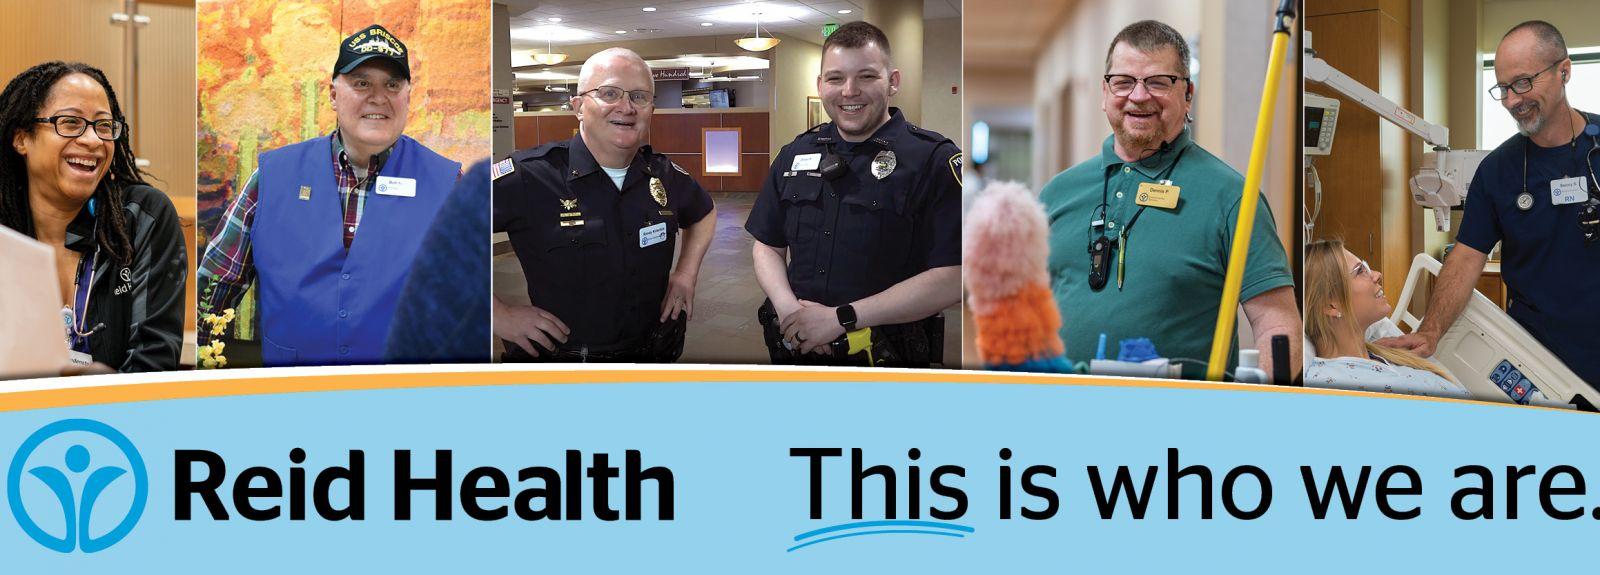 Reid Health employee culture